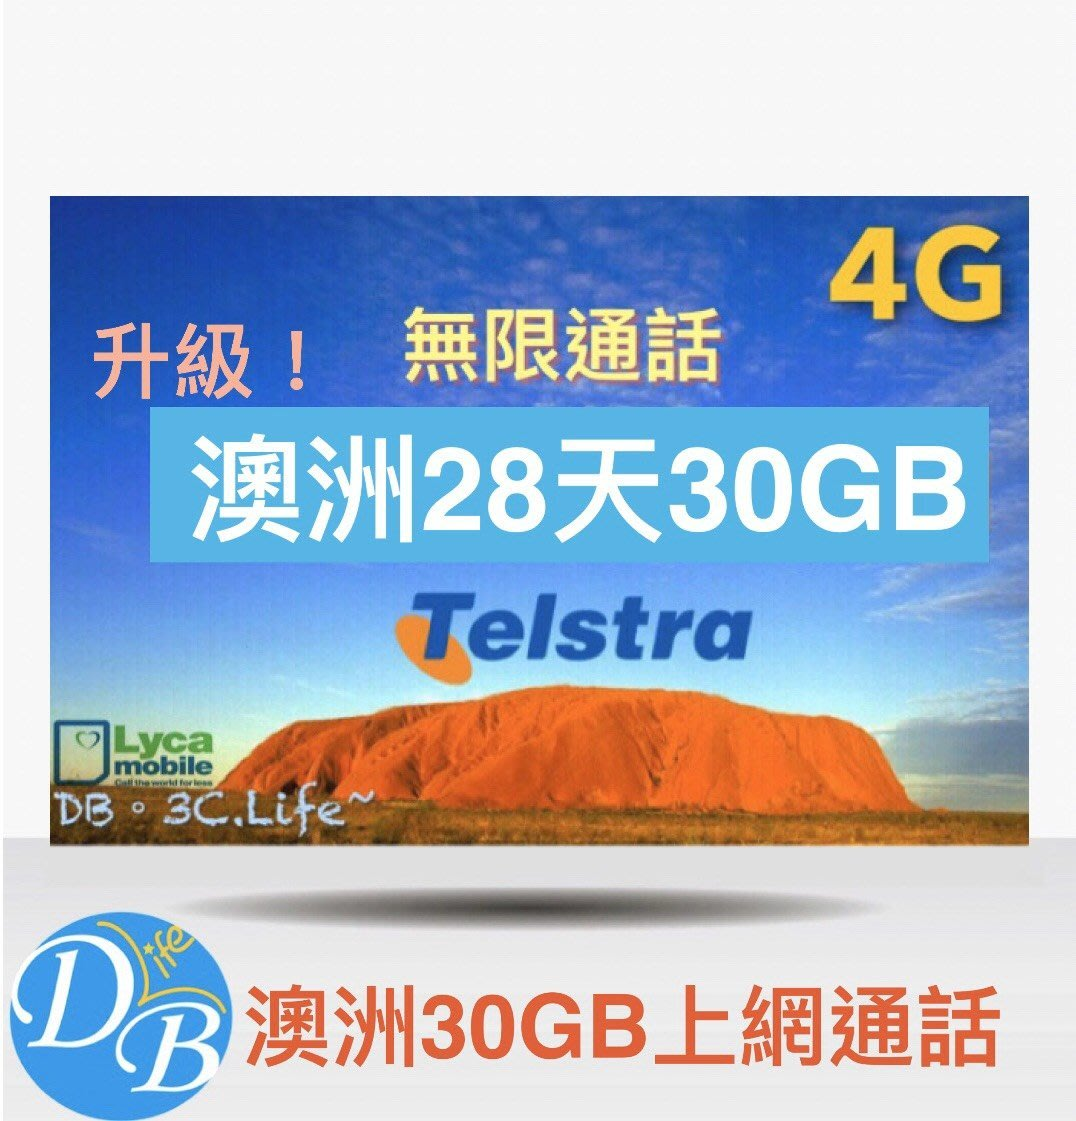 4G【澳洲 28天 30GB 上網+無限通話卡 】LYCA 澳洲Telstra電信  澳洲上網 電話卡 DB 3C